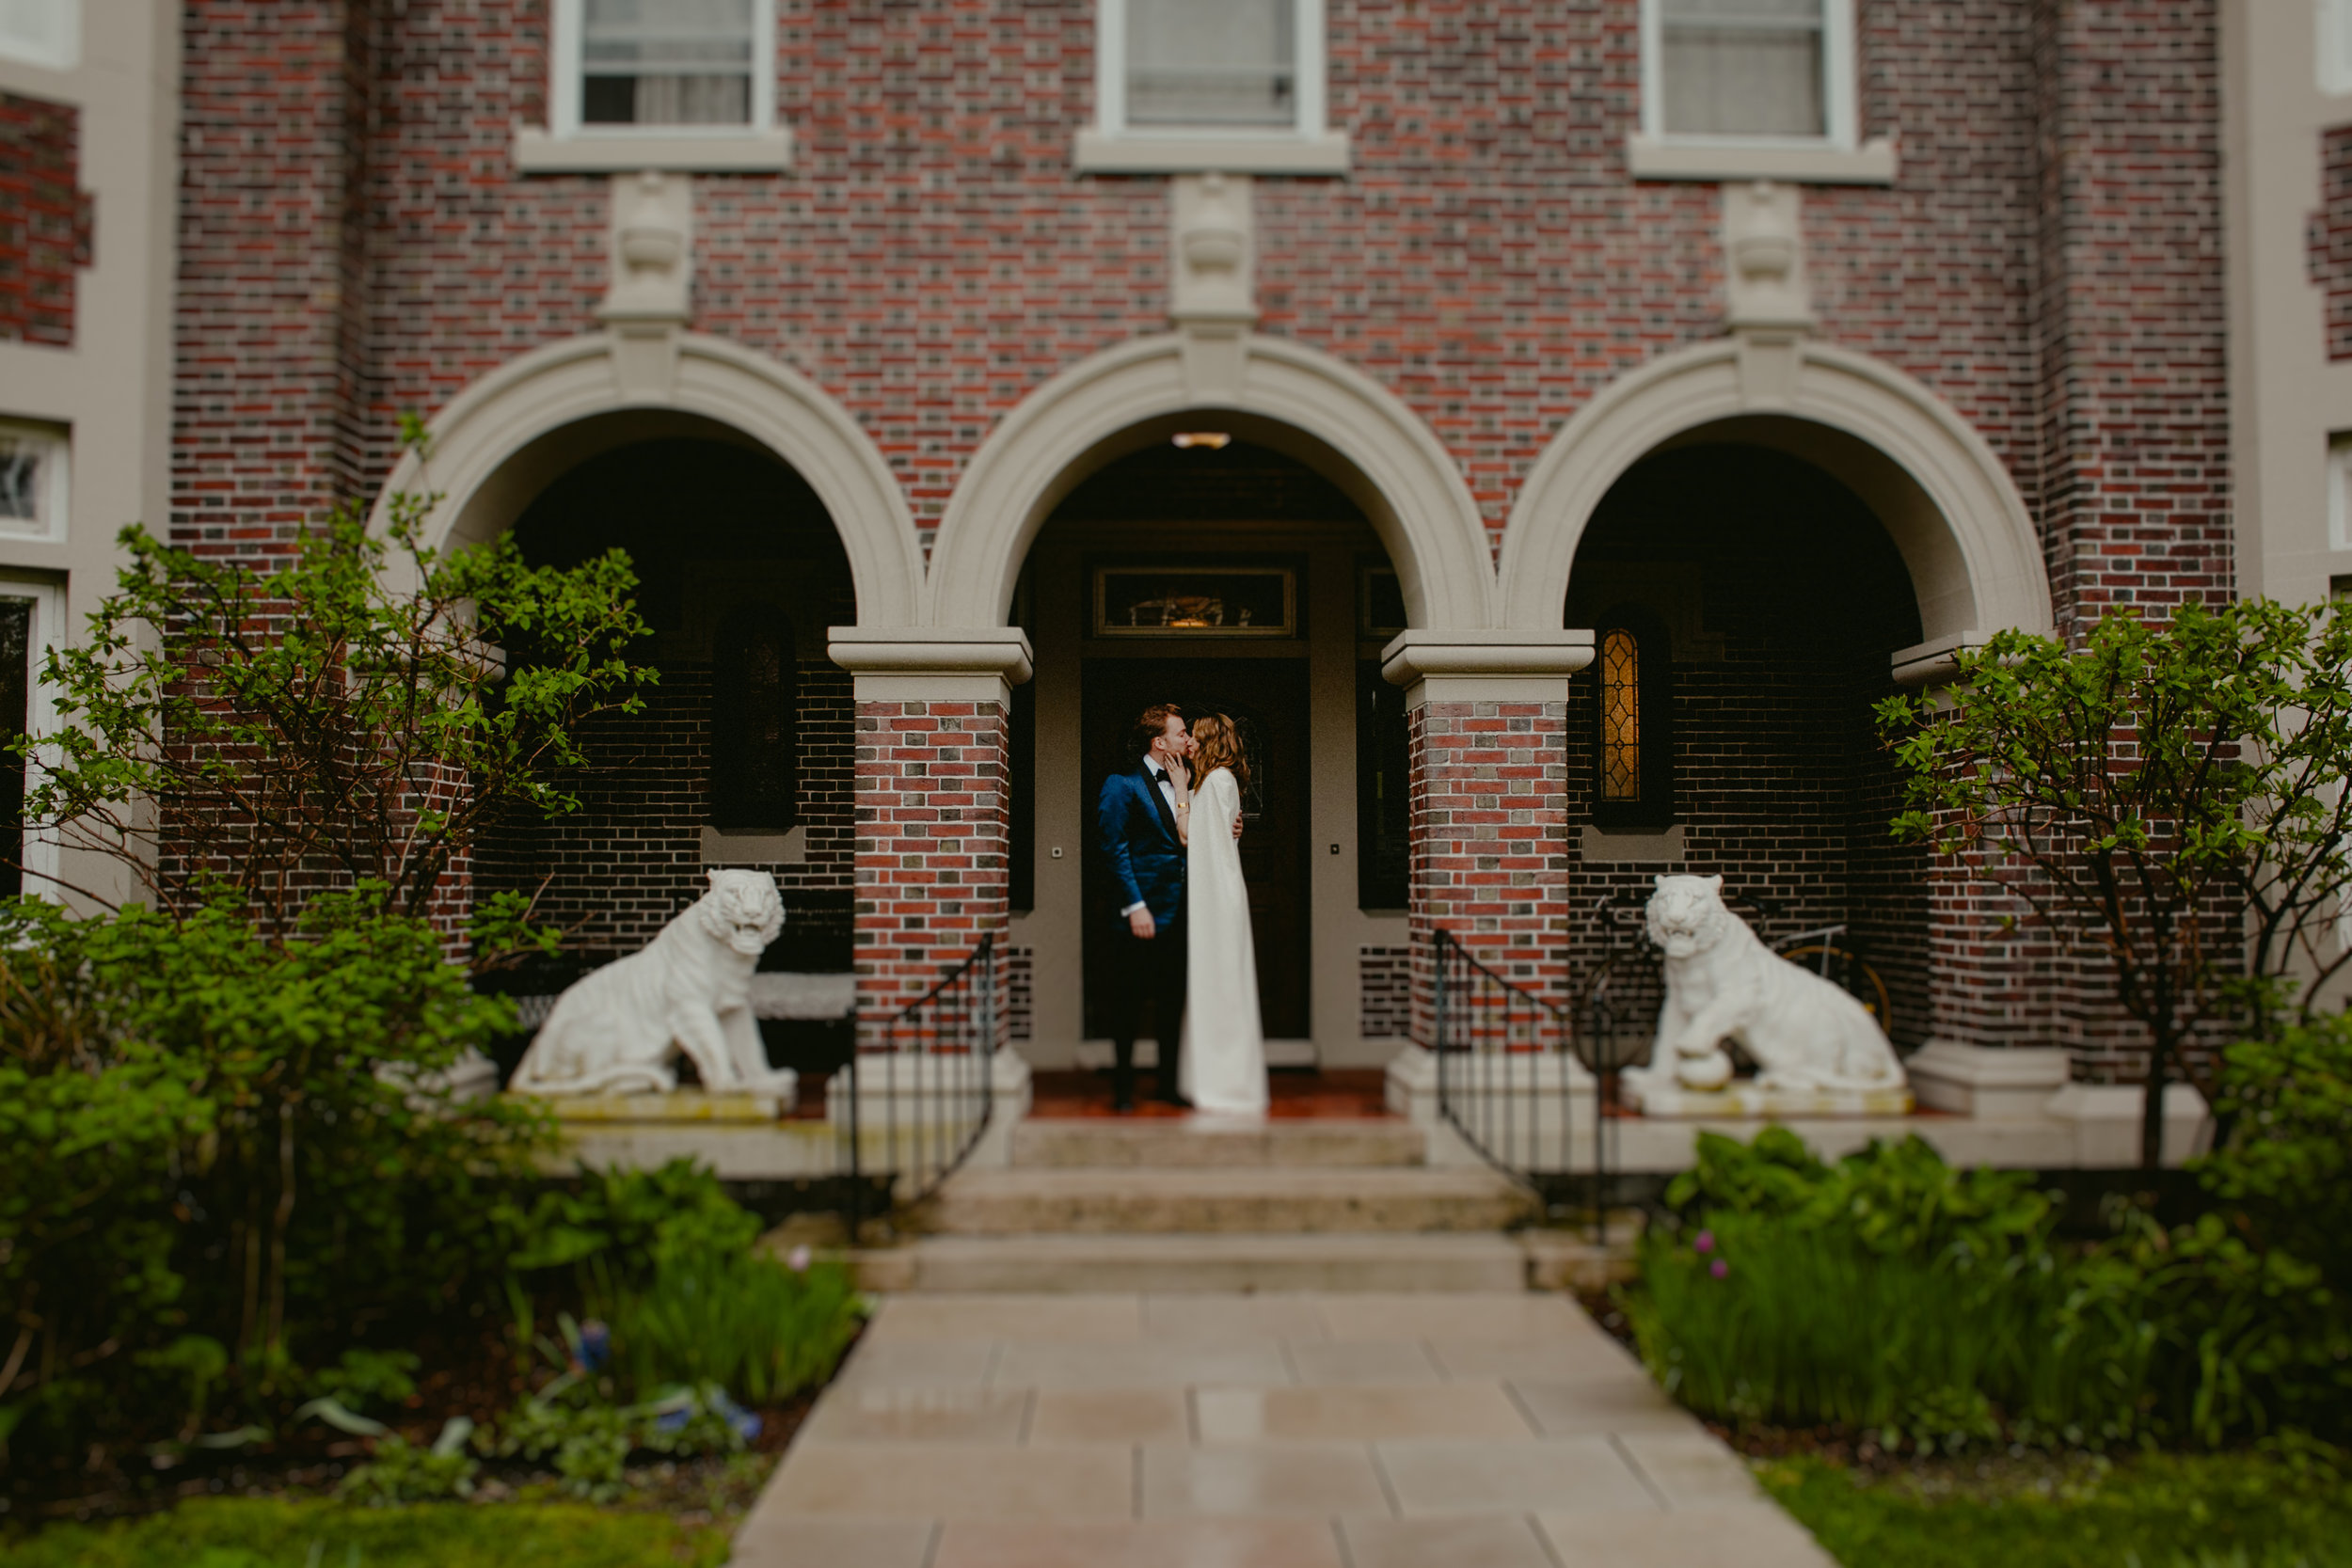 Tiger_House_The_Inn_at_Hudson-Wedding_Chellise_Michael_Photography-313.jpg